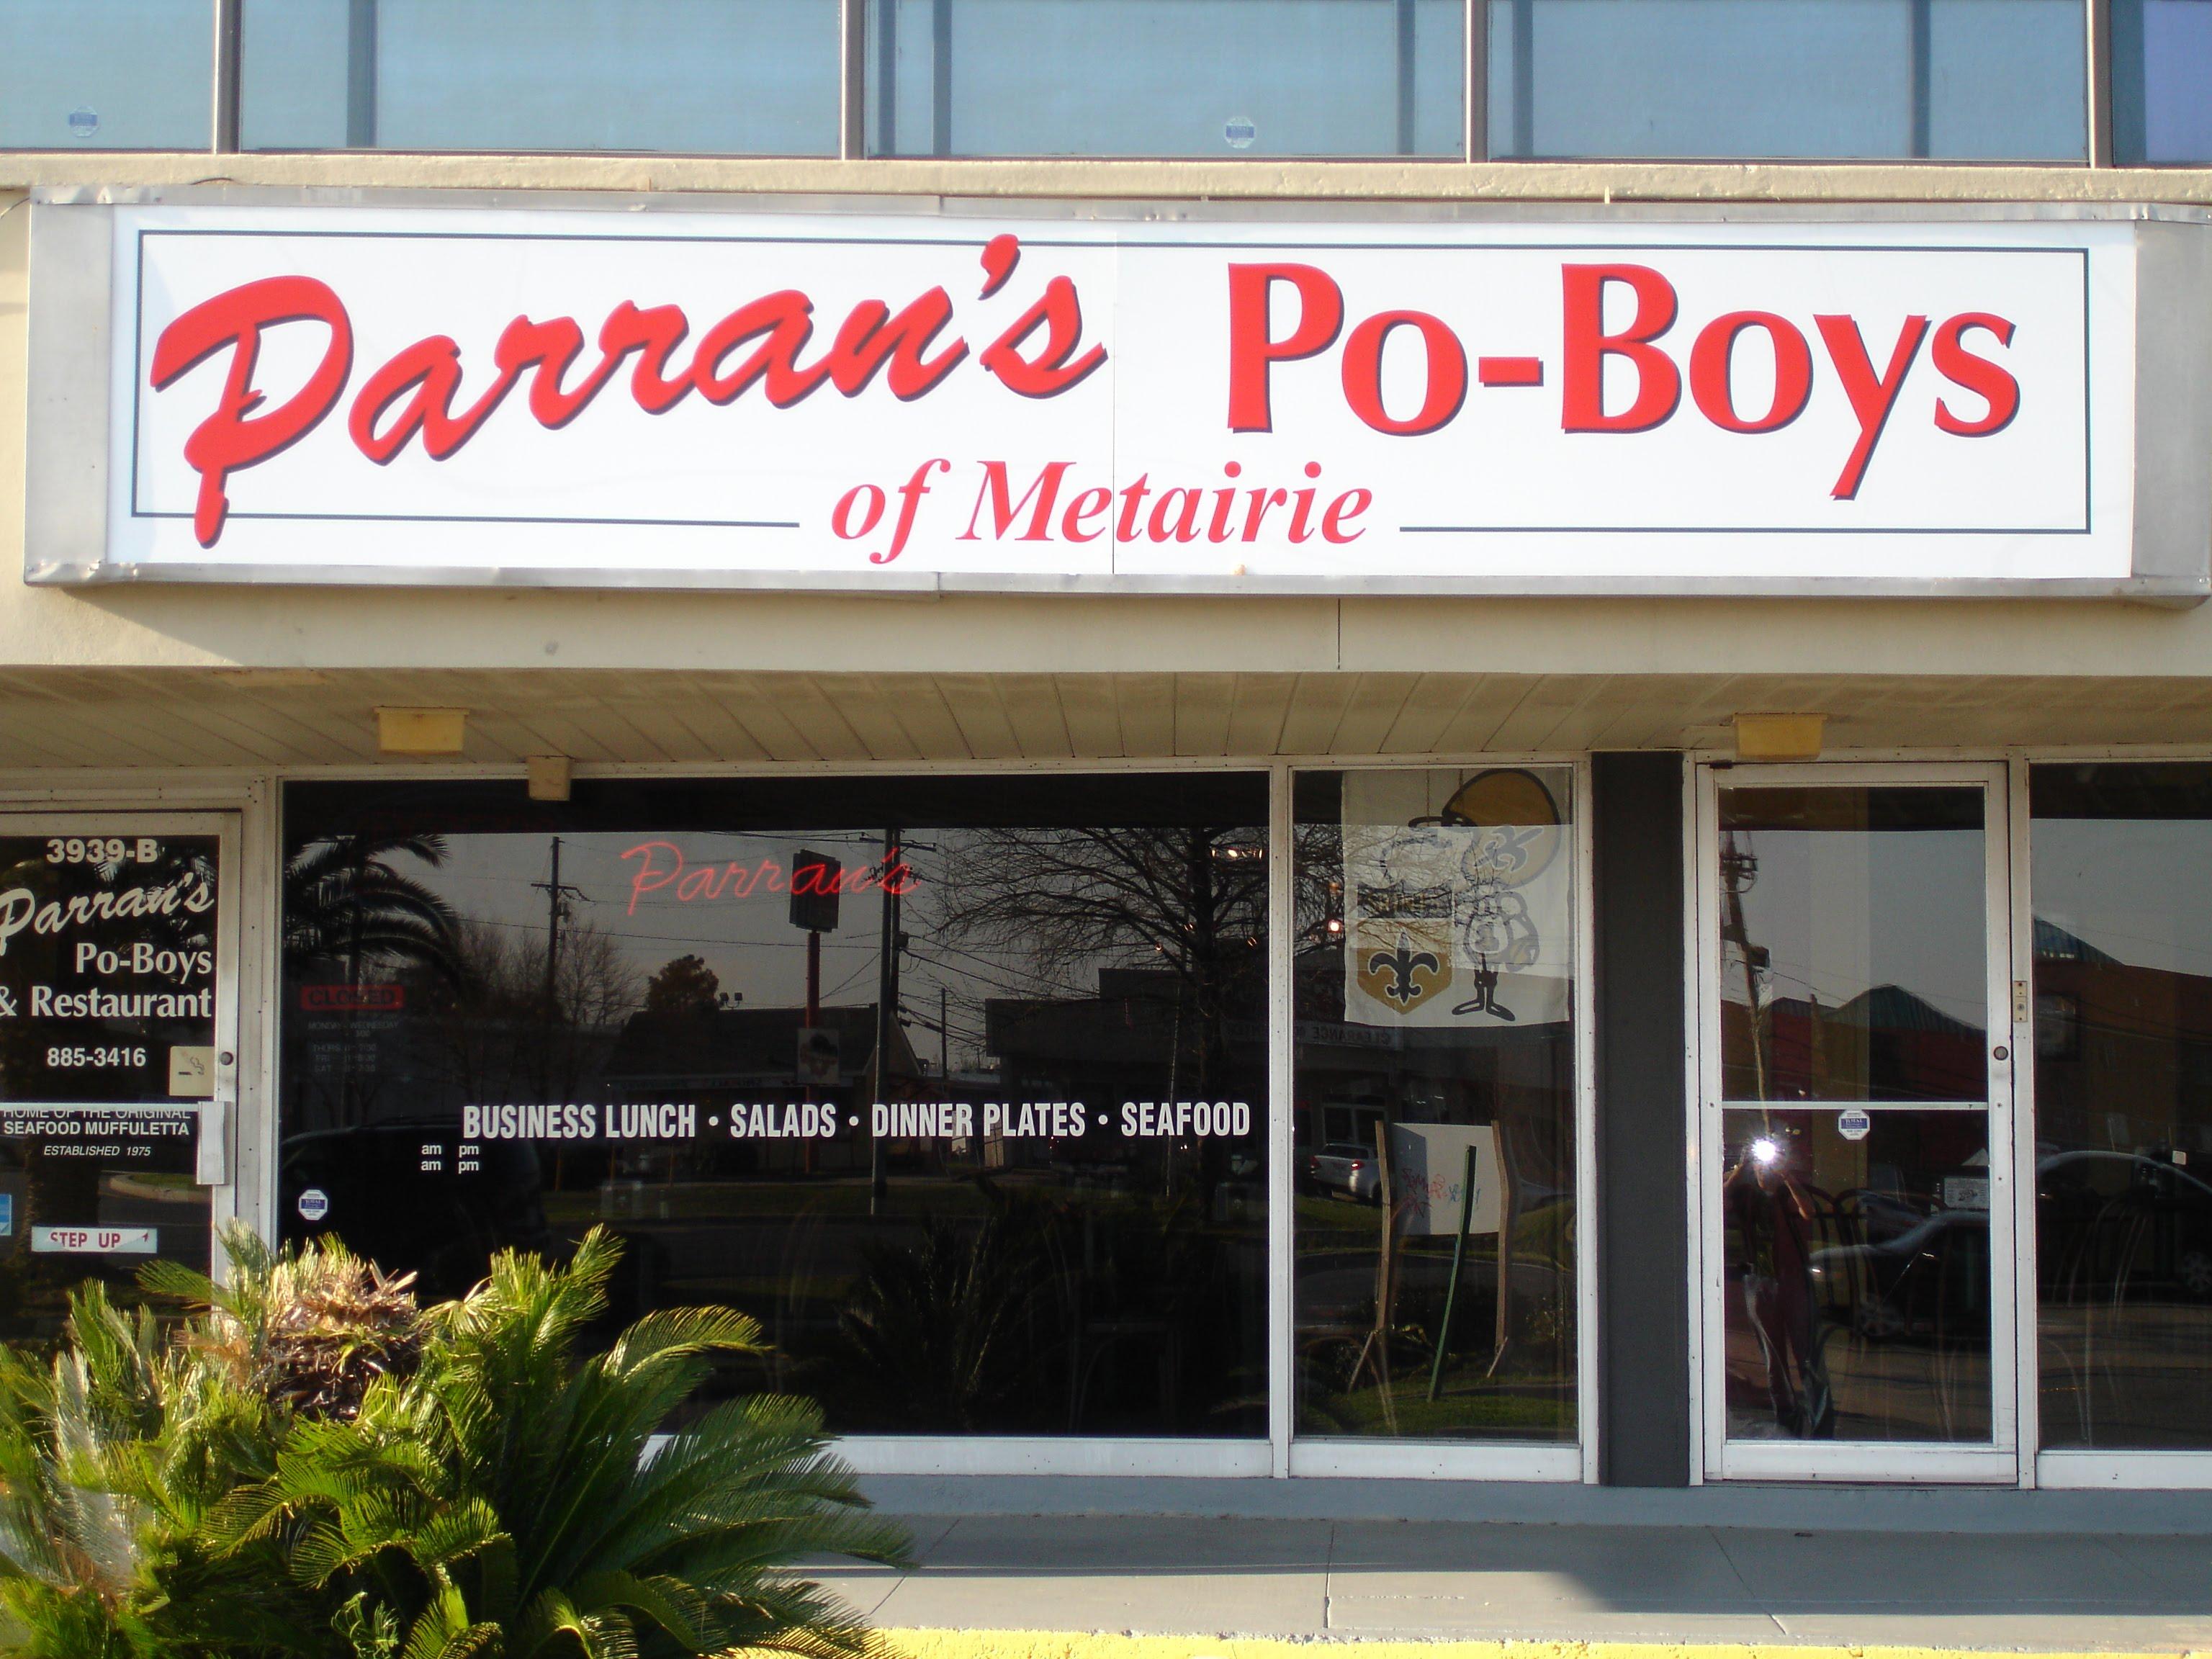 https://itunes.apple.com/us/app/parrans-po-boys-restaurant/id775350195?mt=8